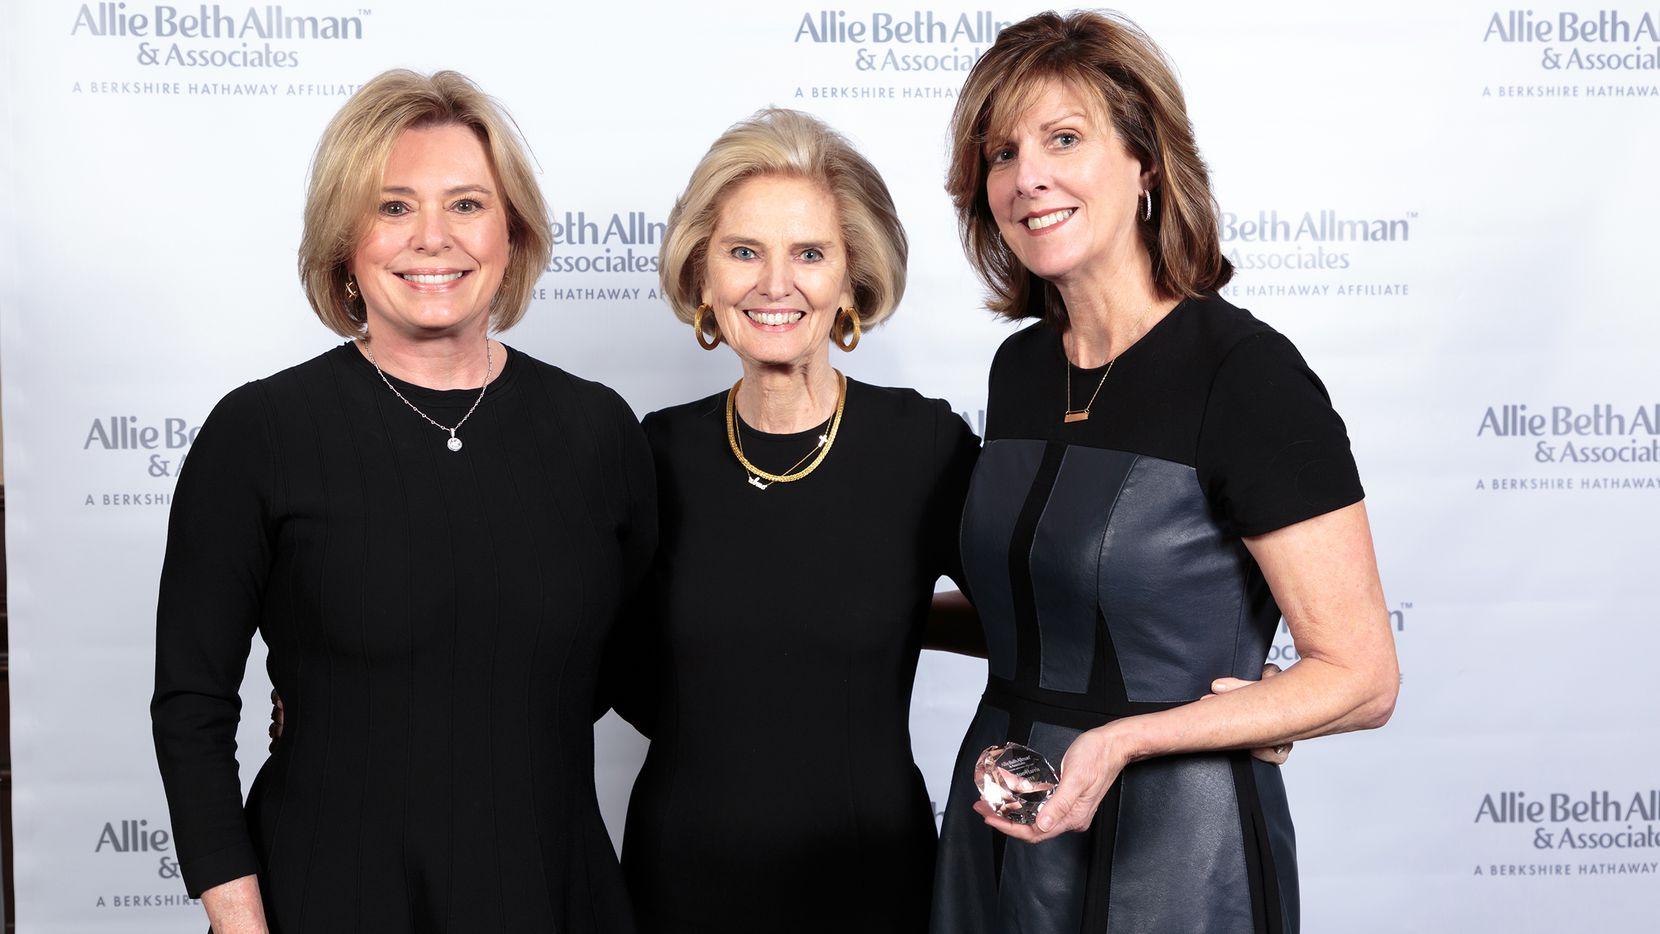 The Pinkston/Harris Team was named Allie Beth Allman & Associates' No. 1 Top Producer Team for 2019. From left, Stephanie Pinkston, president/CEO Allie Beth Allman and Margie Harris.